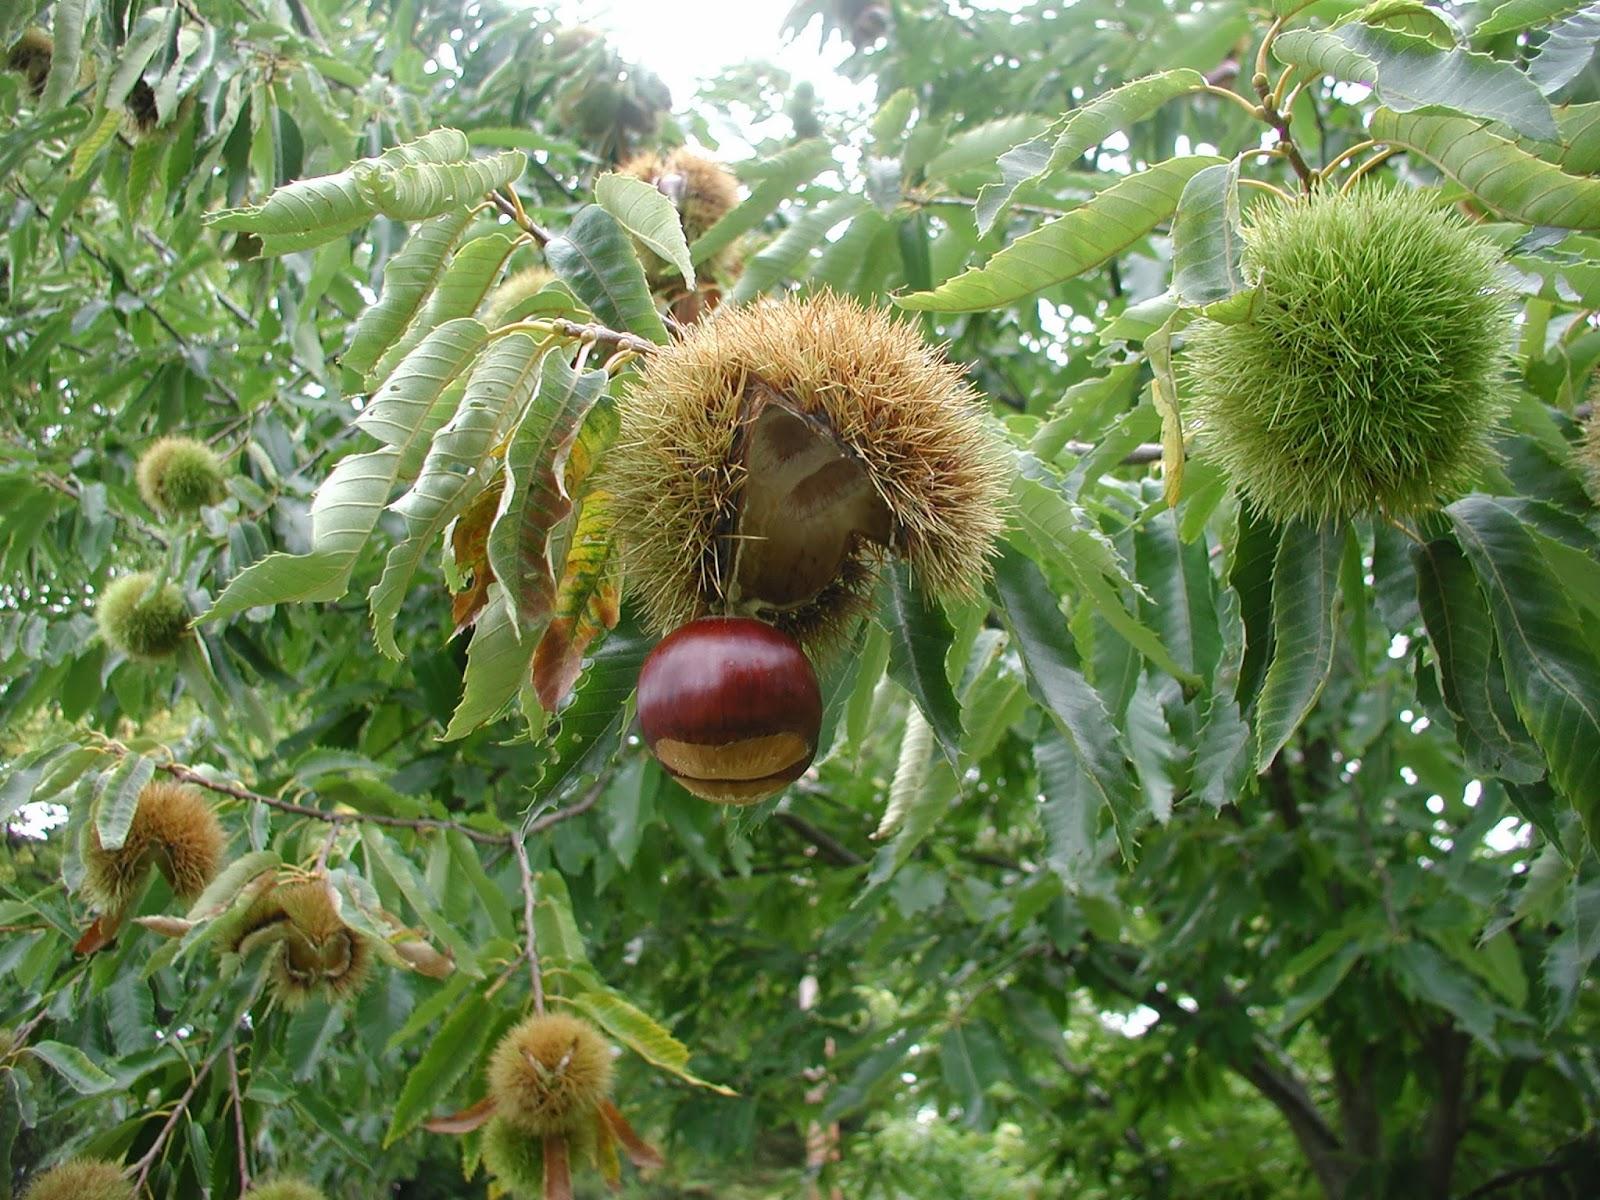 In lee 39 s garden now october 2013 for The chestnut